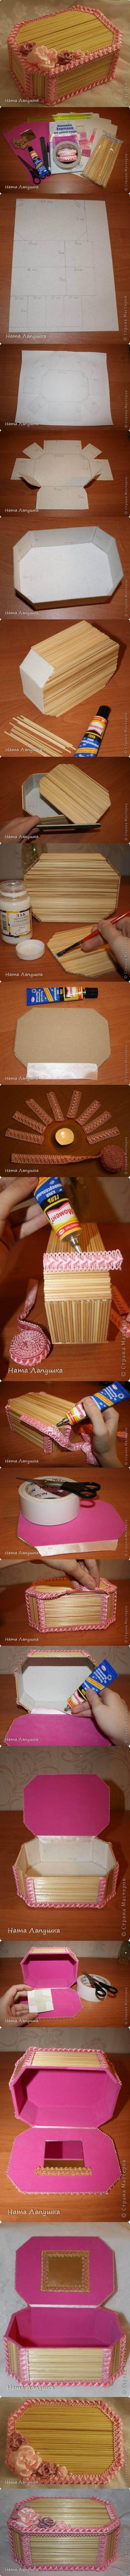 Caja con palillos! | Manualidades Gratis